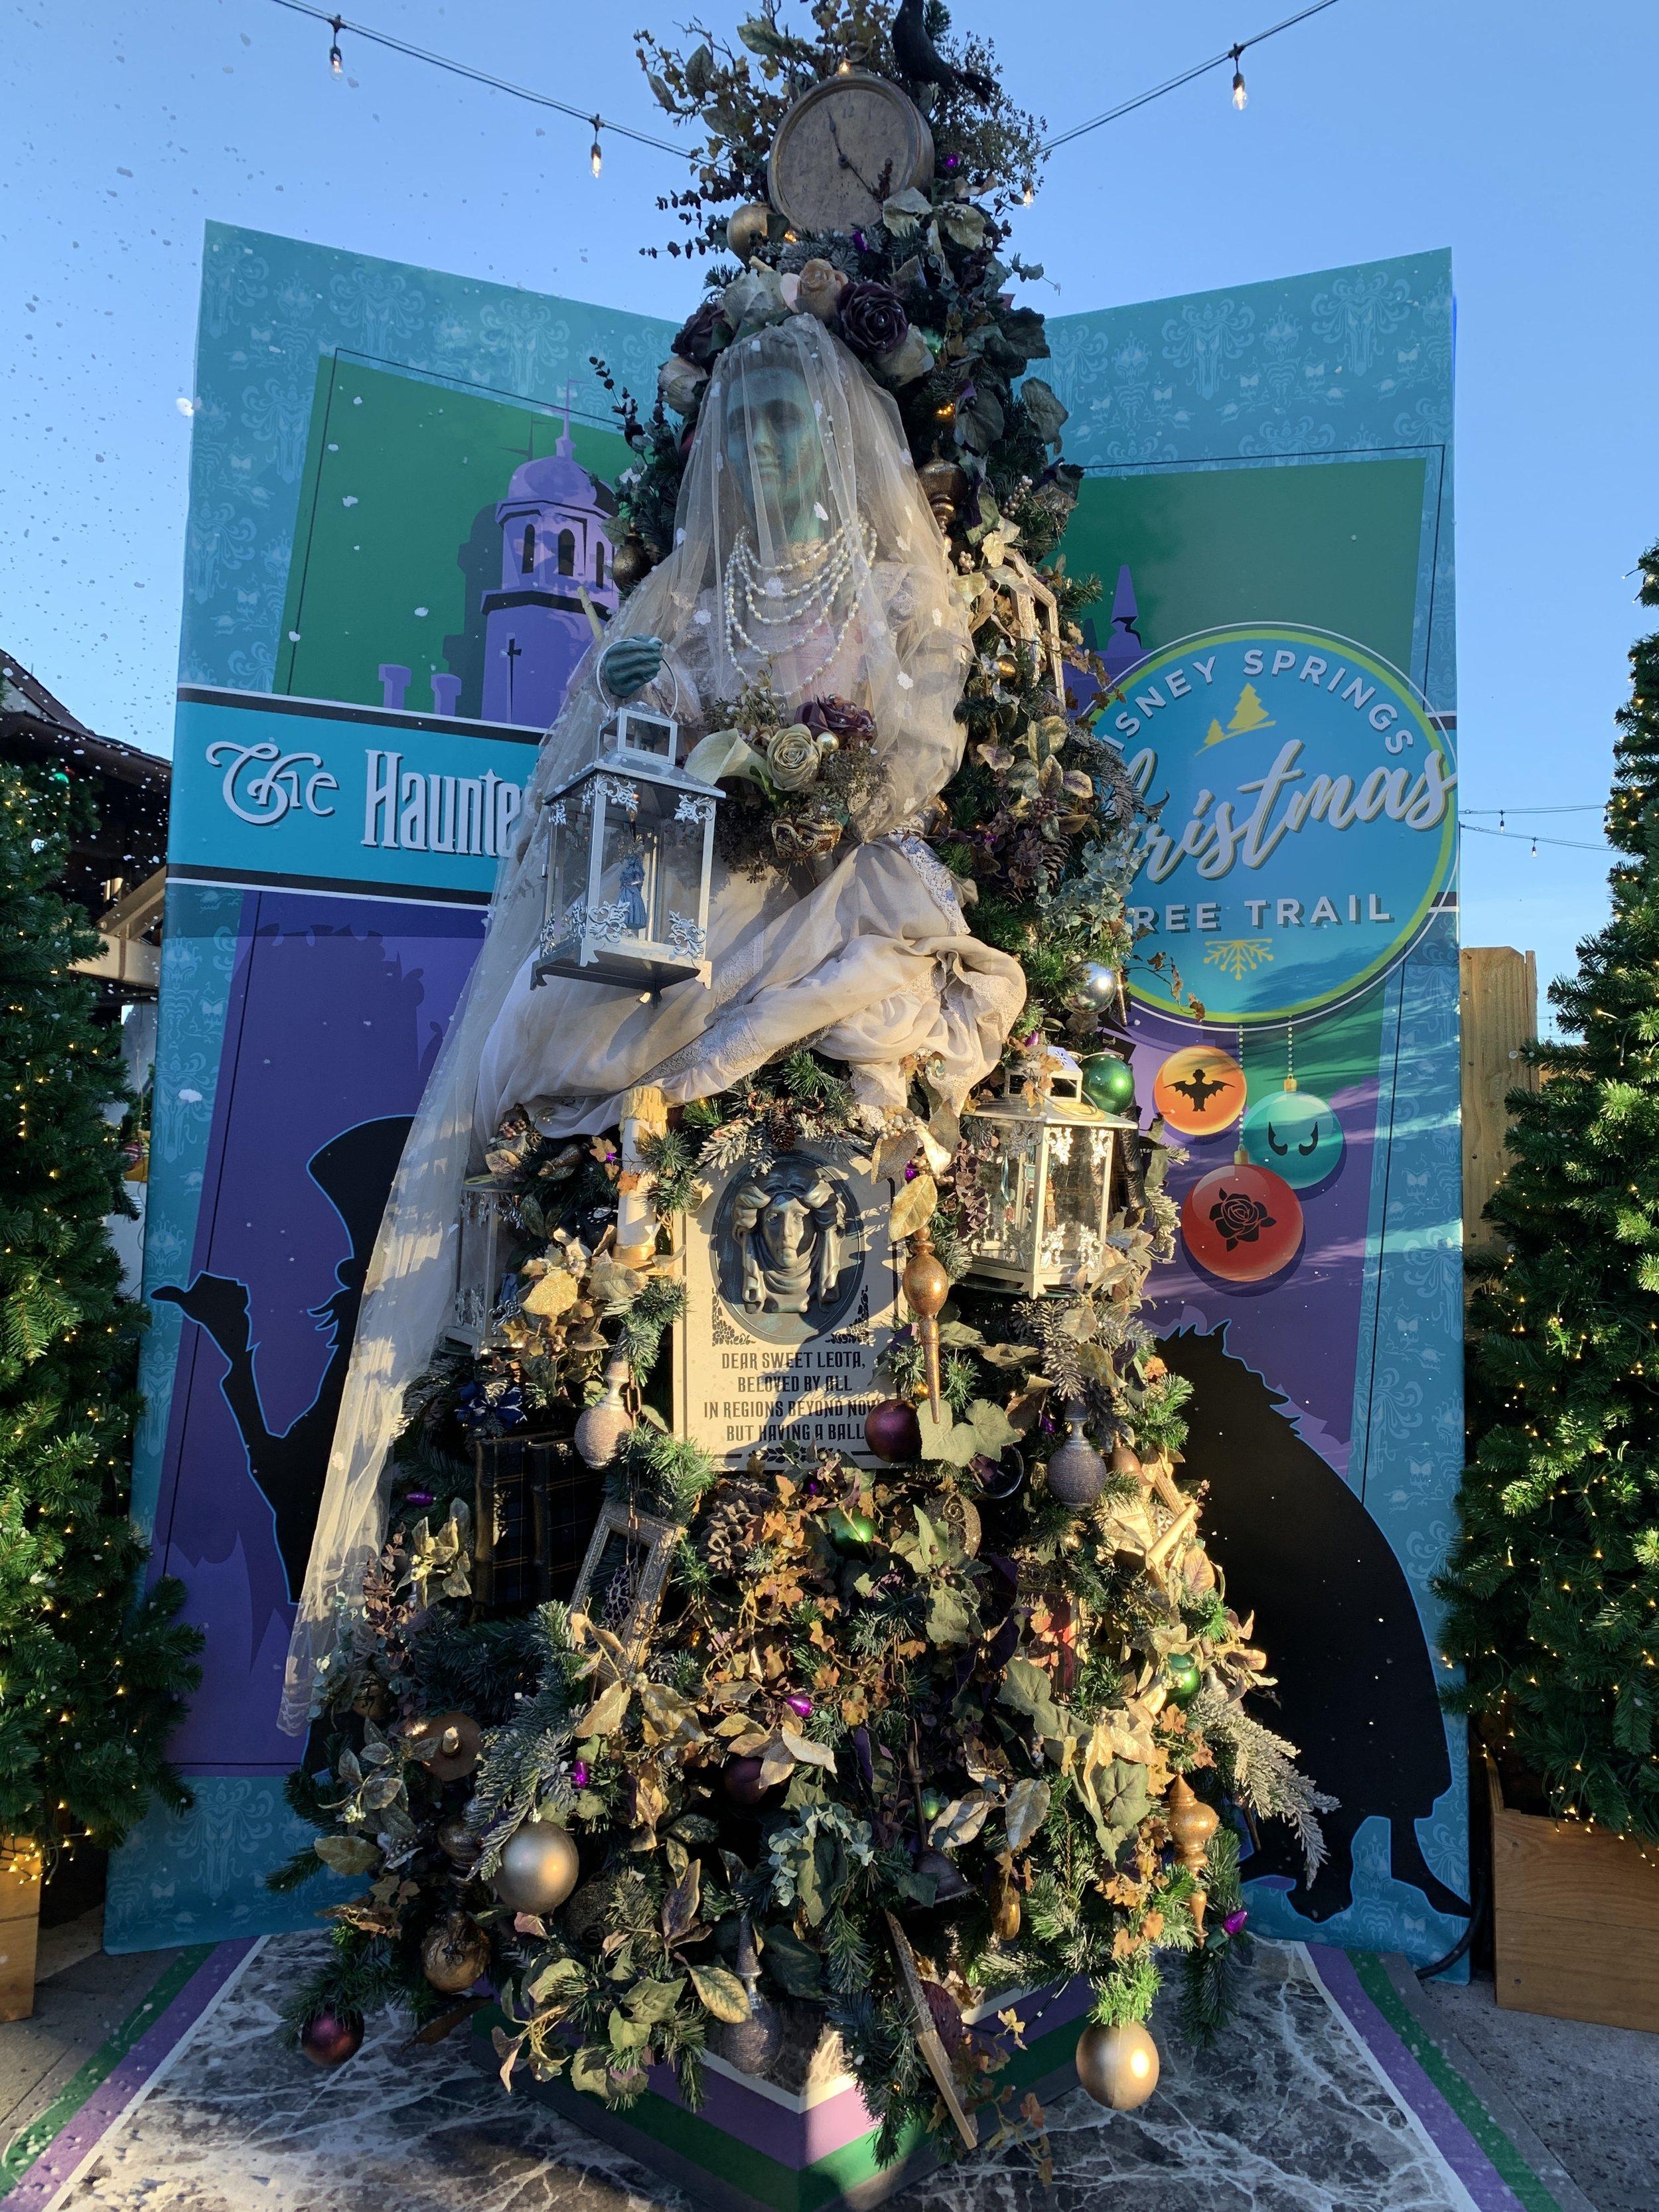 The Haunted Mansion Tree. Super creepy!